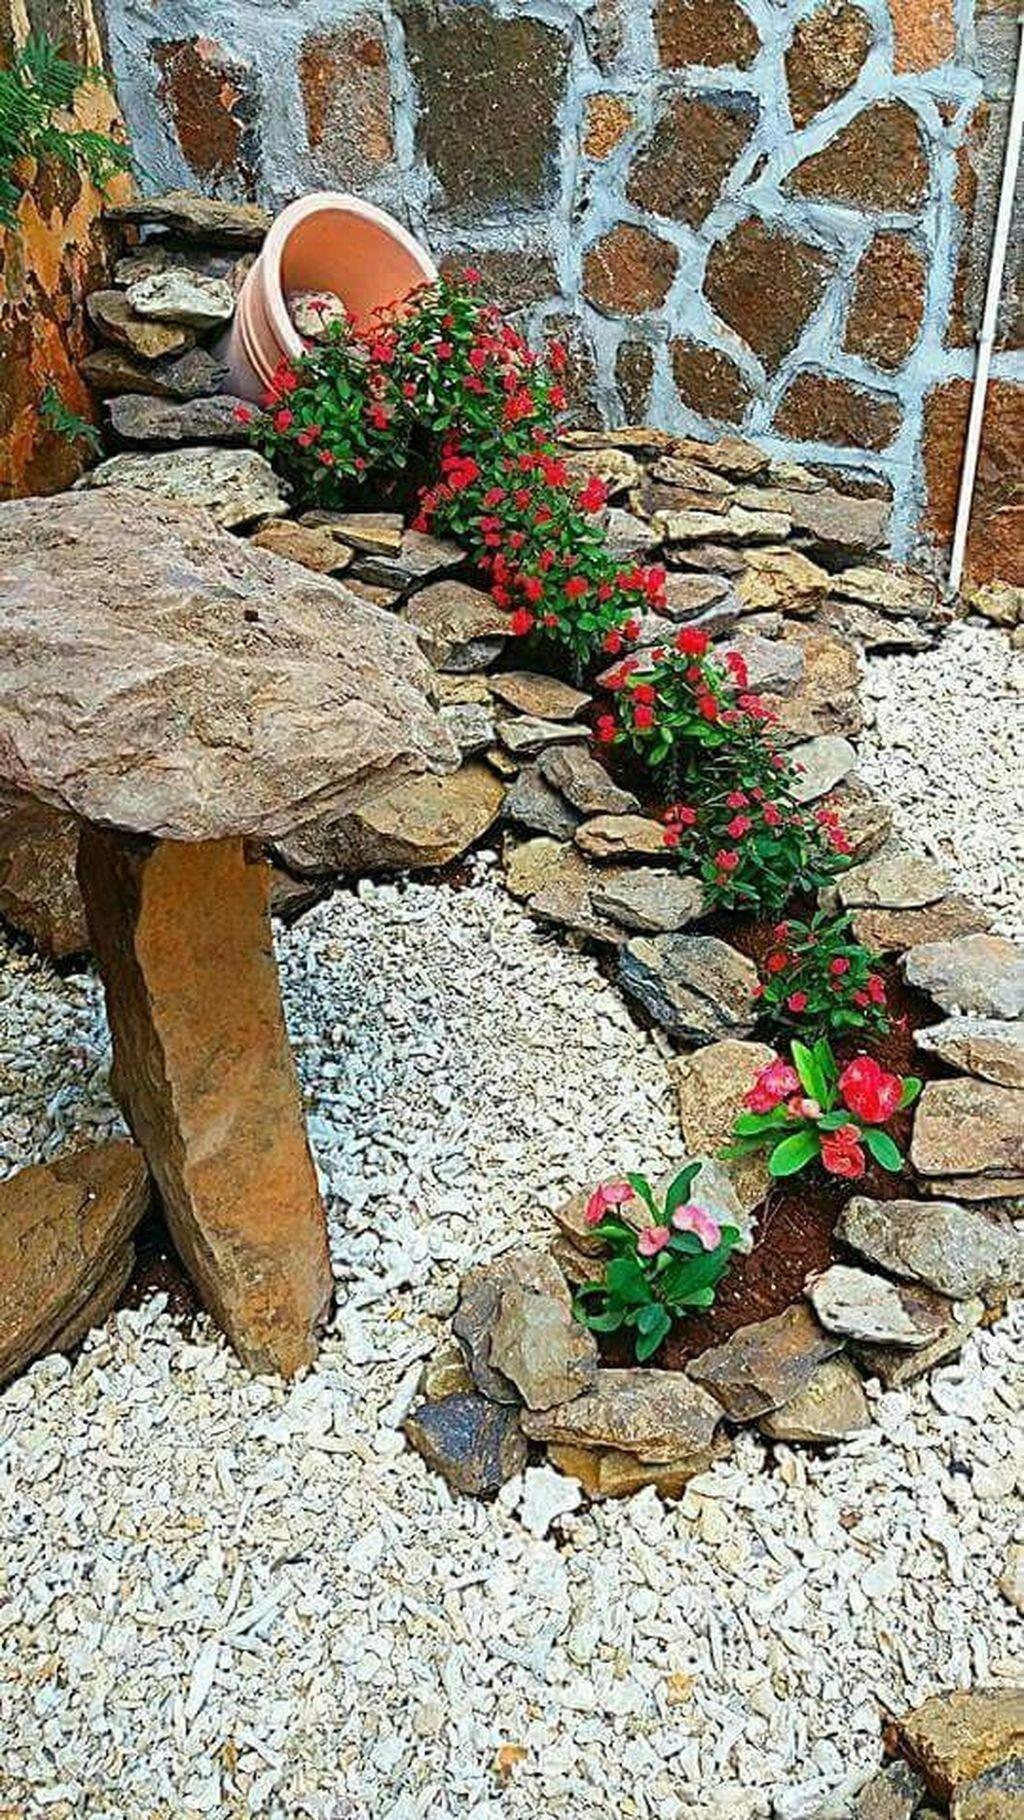 Simple Rock Garden Decor Ideas For Front And Back Yard 22 Rock Garden Landscaping Front Yard Landscaping Backyard Garden